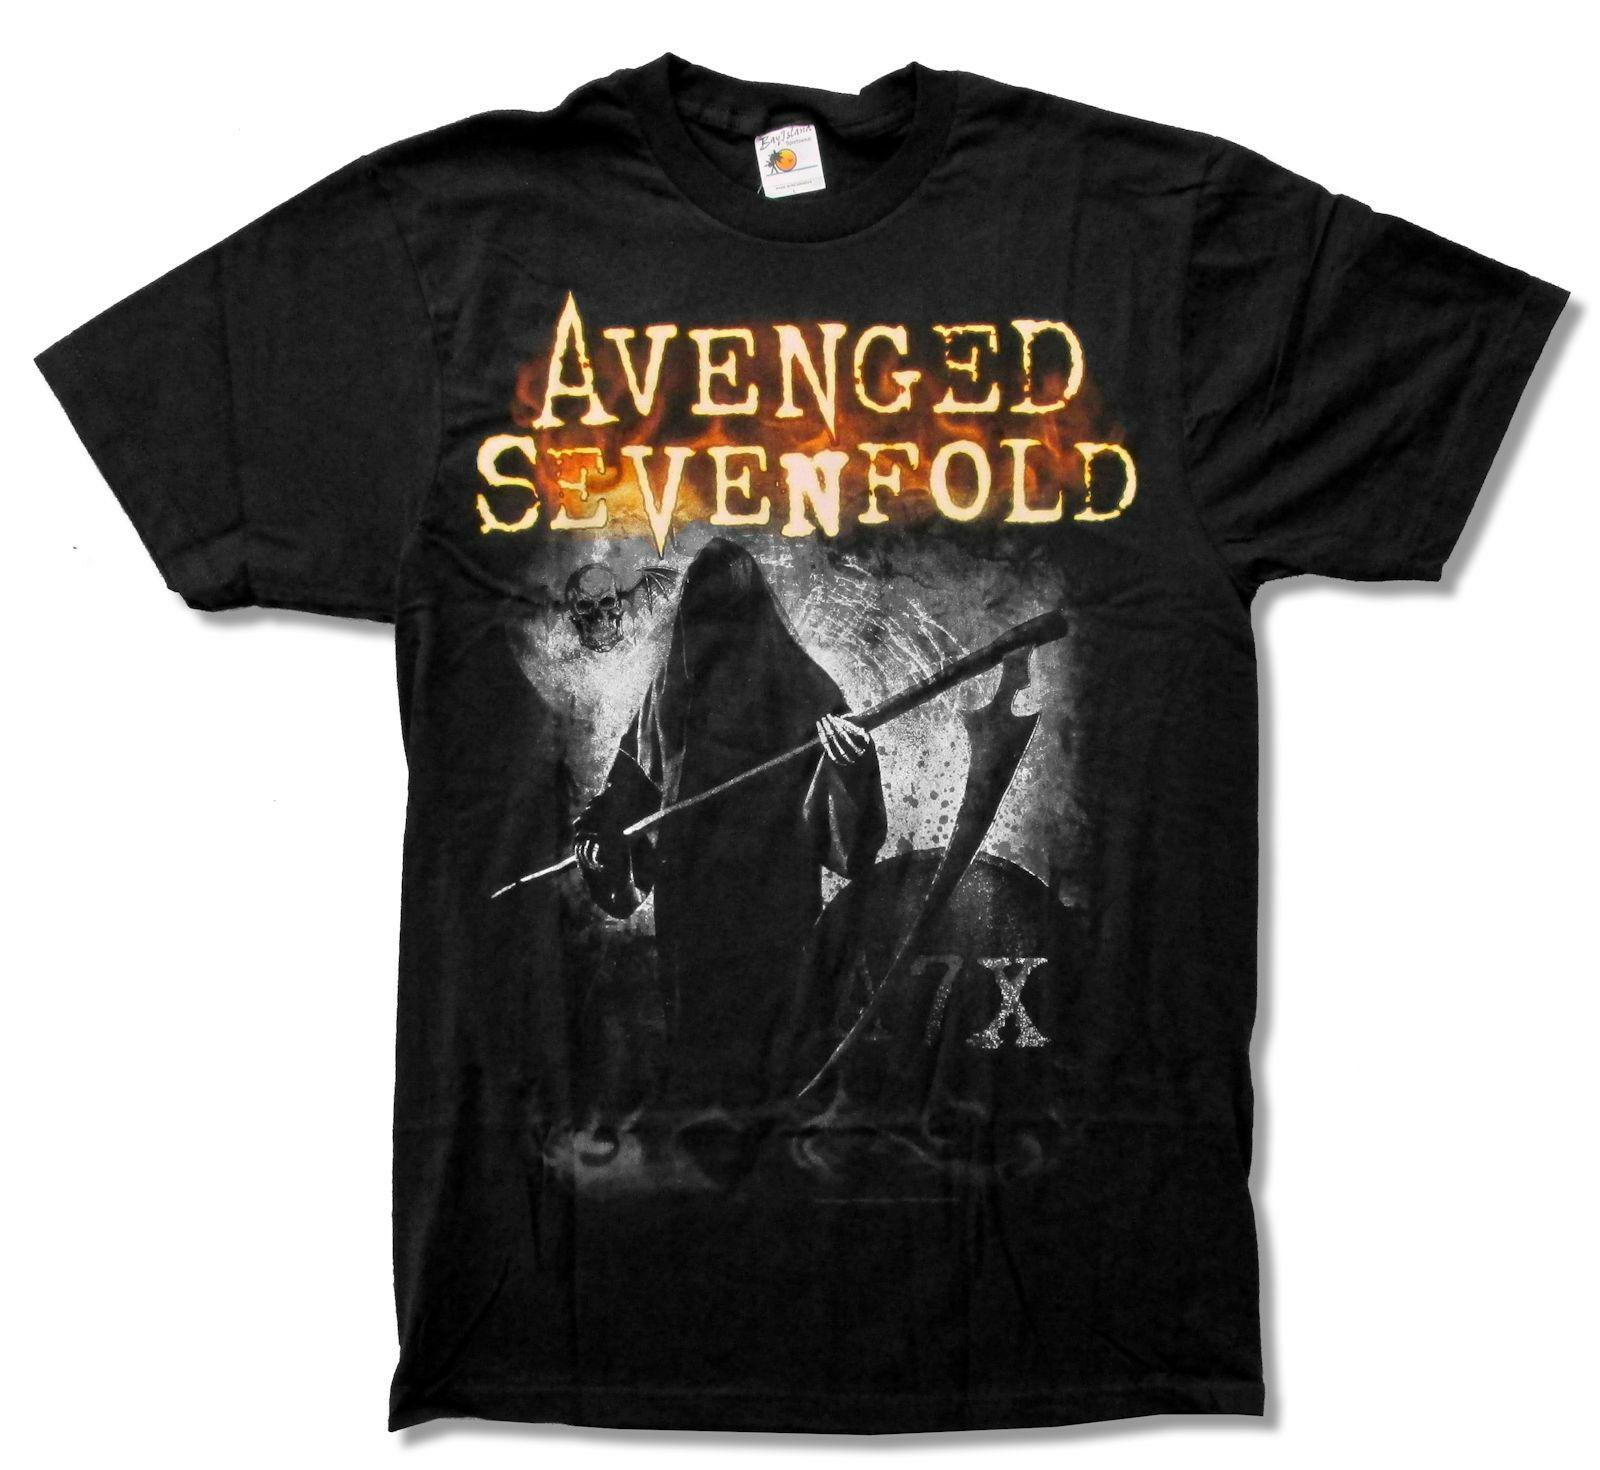 Camiseta negra Grimm venged Sevenfold nuevo adulto oficial A7X hombre estampado camiseta Hipster camiseta